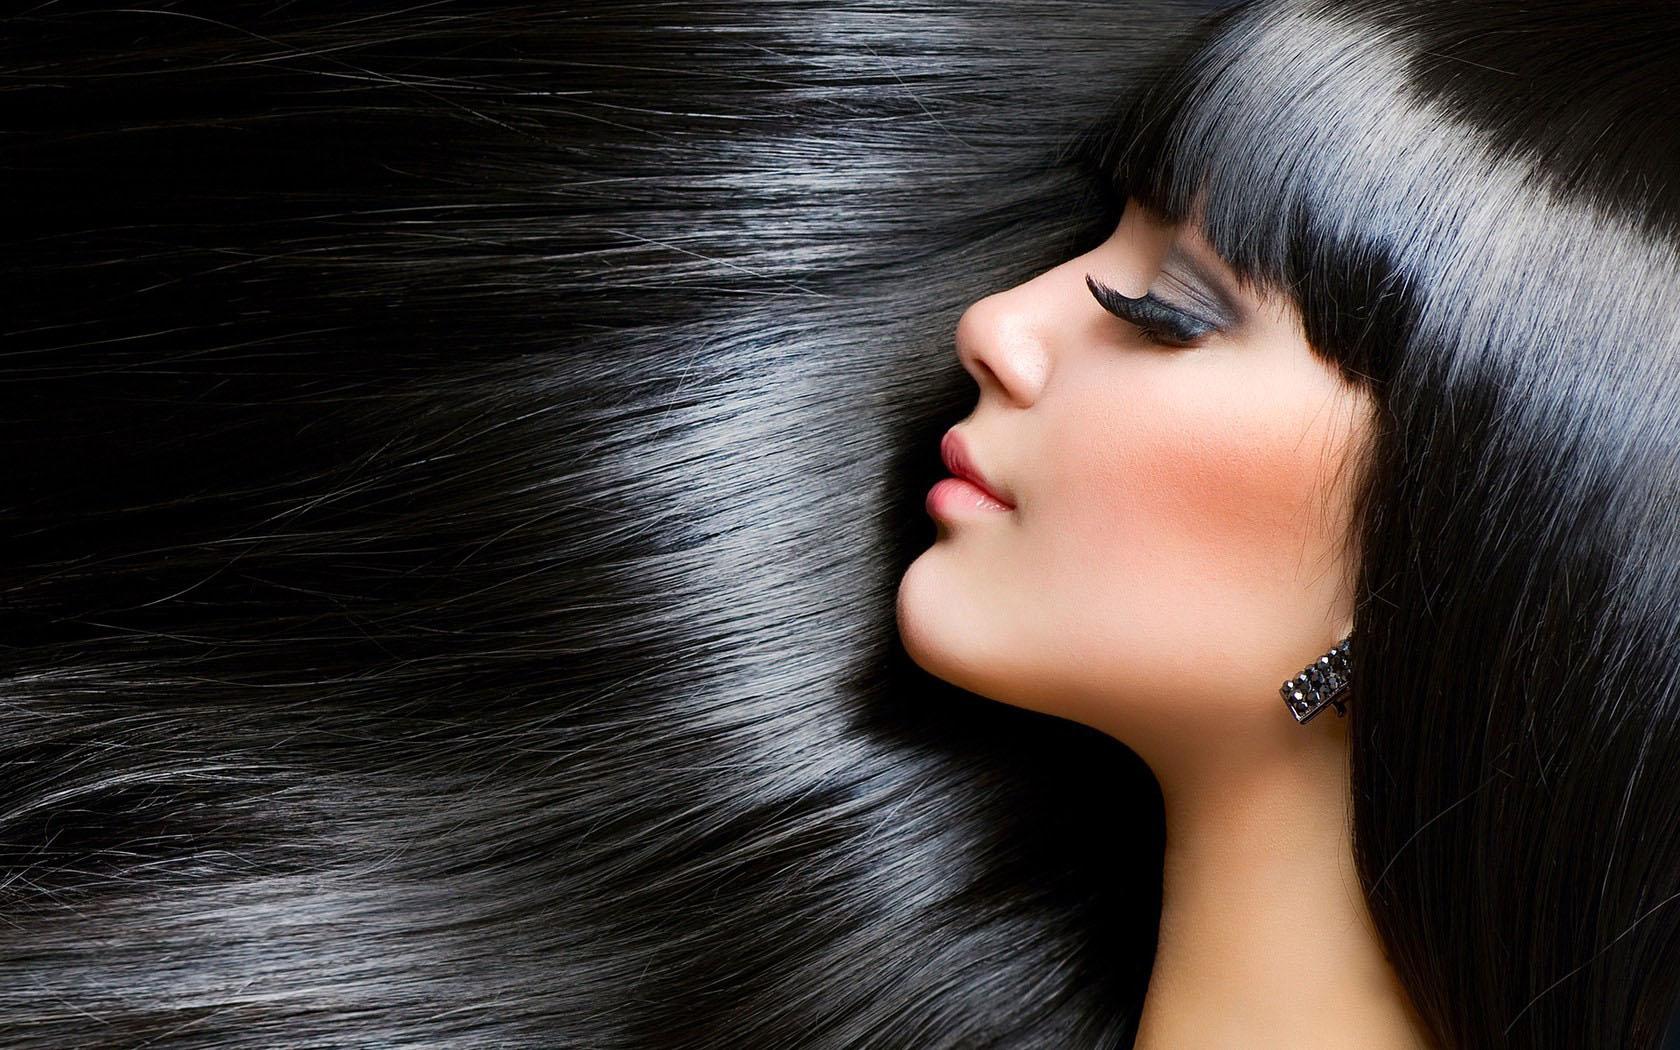 30 Manfaat Santan Kelapa Bagi Kesehatan dan Kecantikan Yang Wajib Anda Ketahui 10